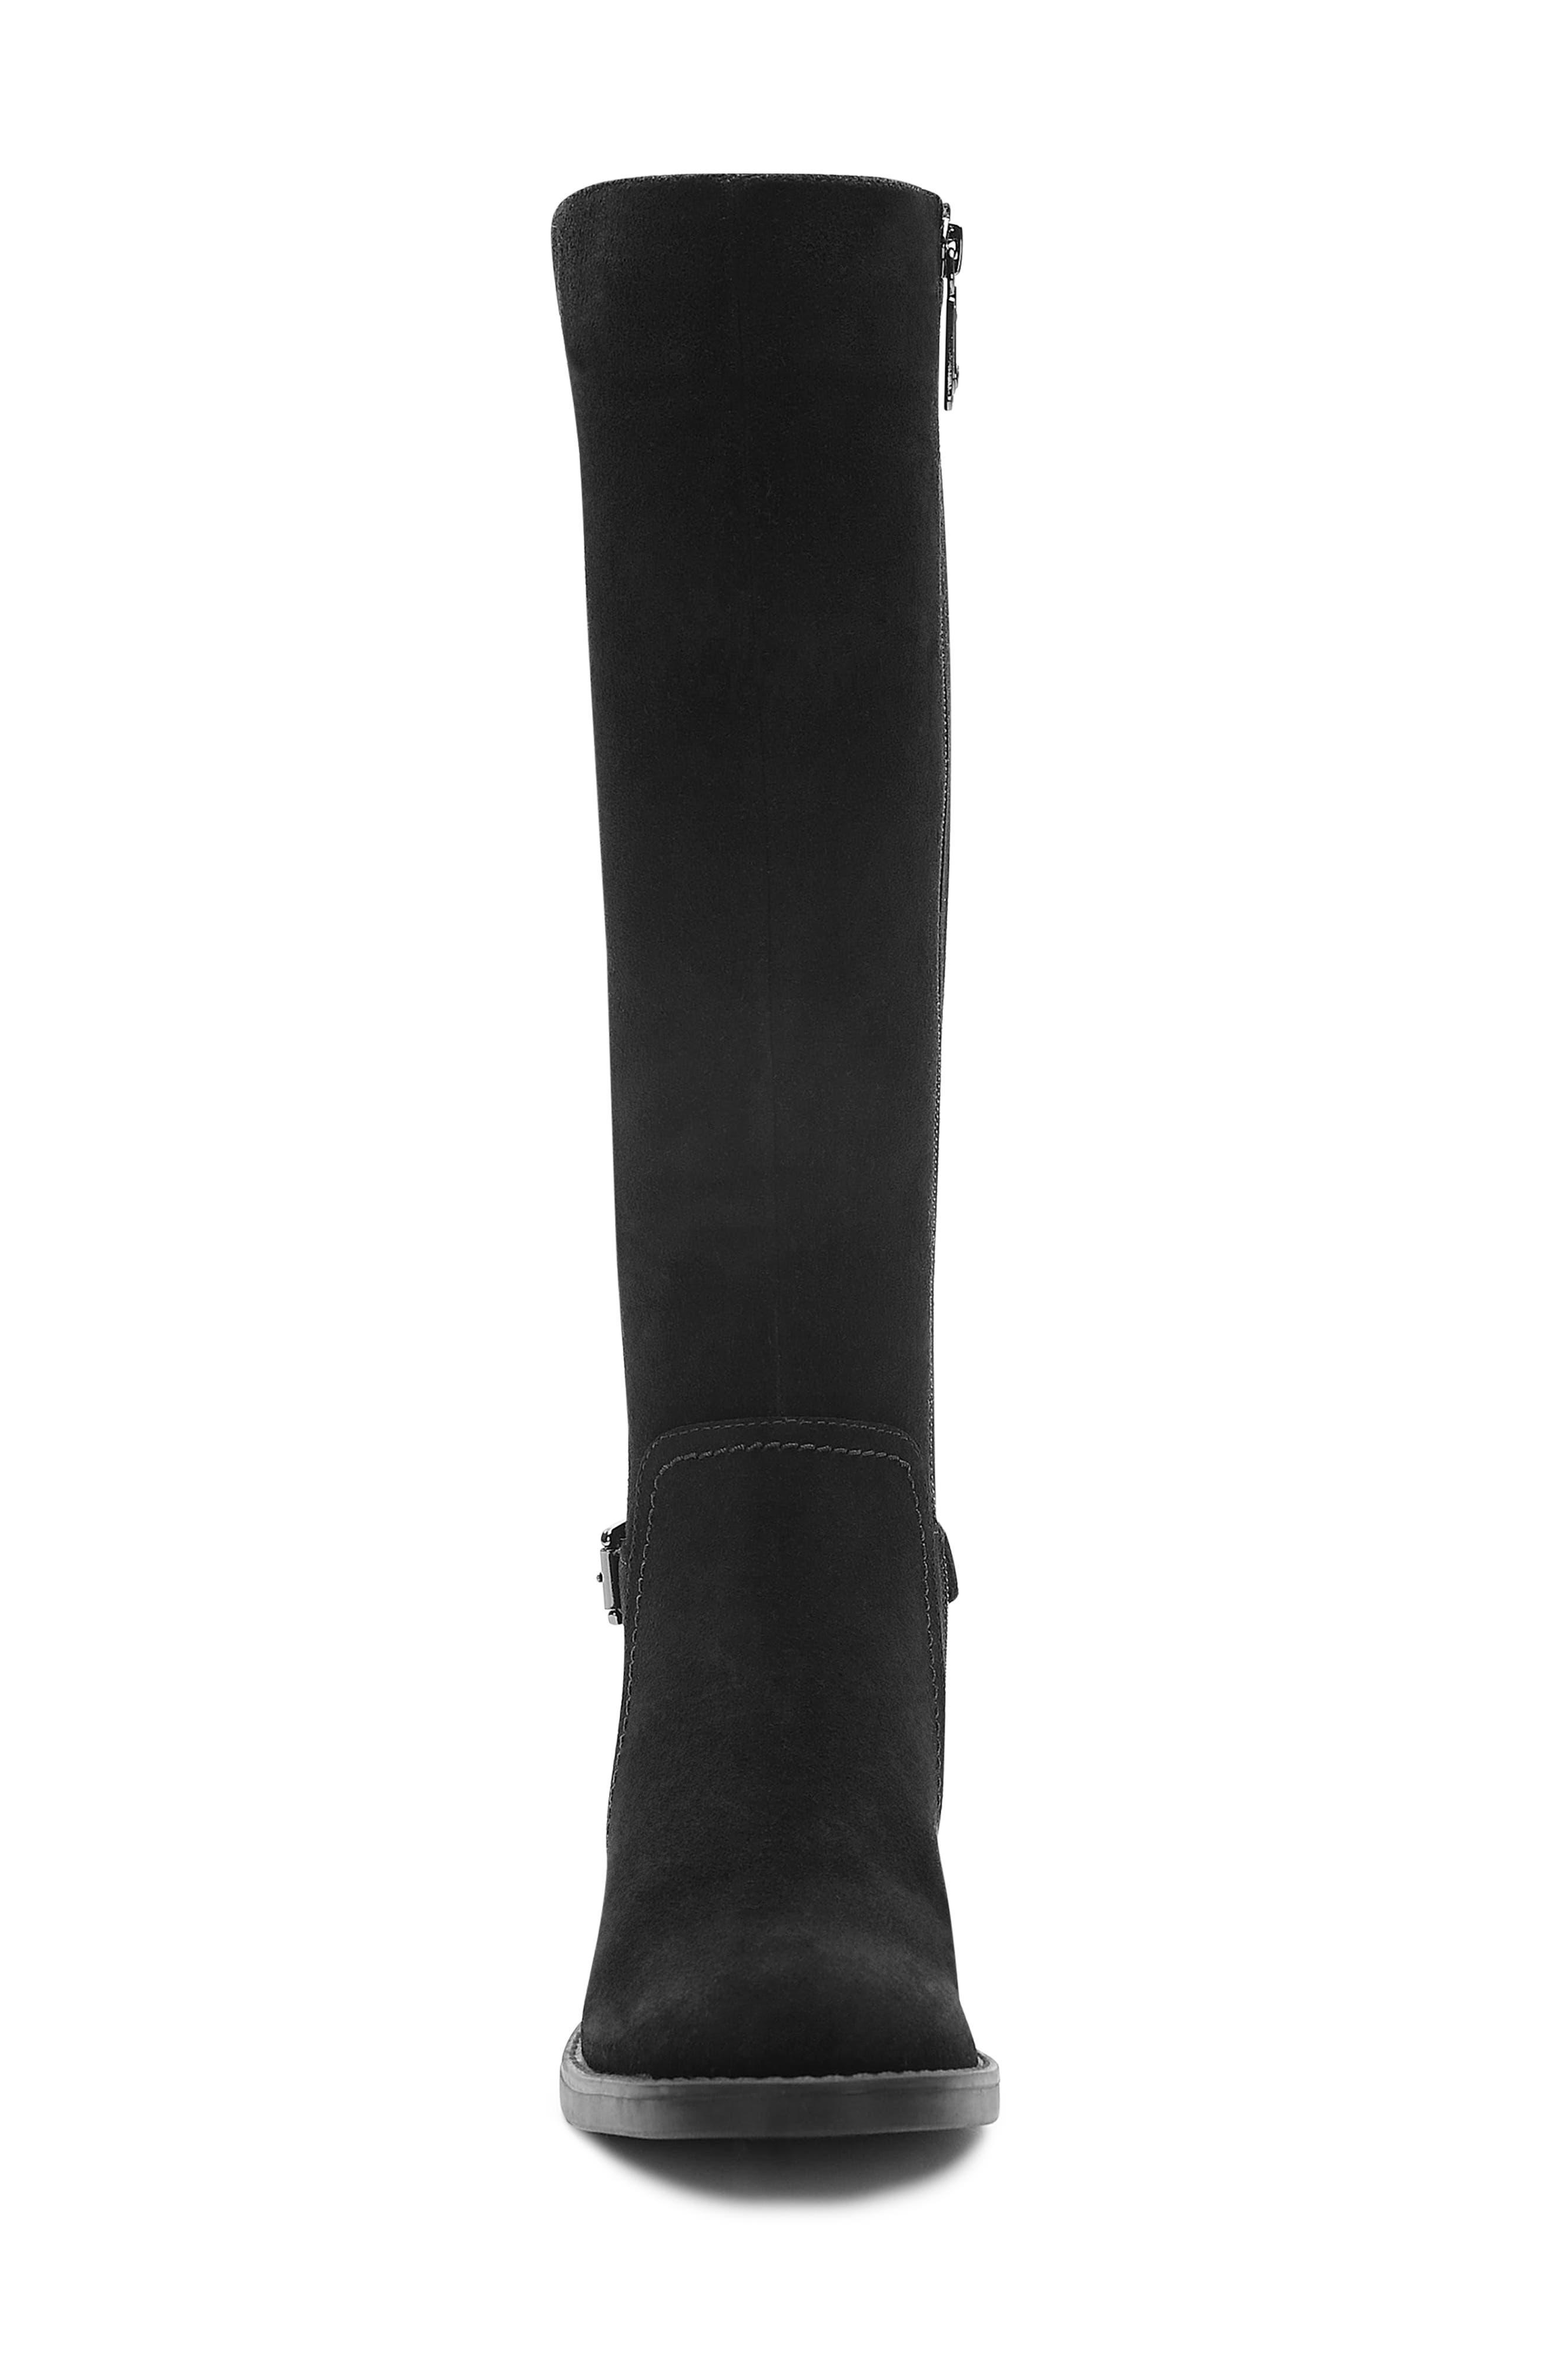 Evie Riding Boot,                             Alternate thumbnail 4, color,                             BLACK SUEDE